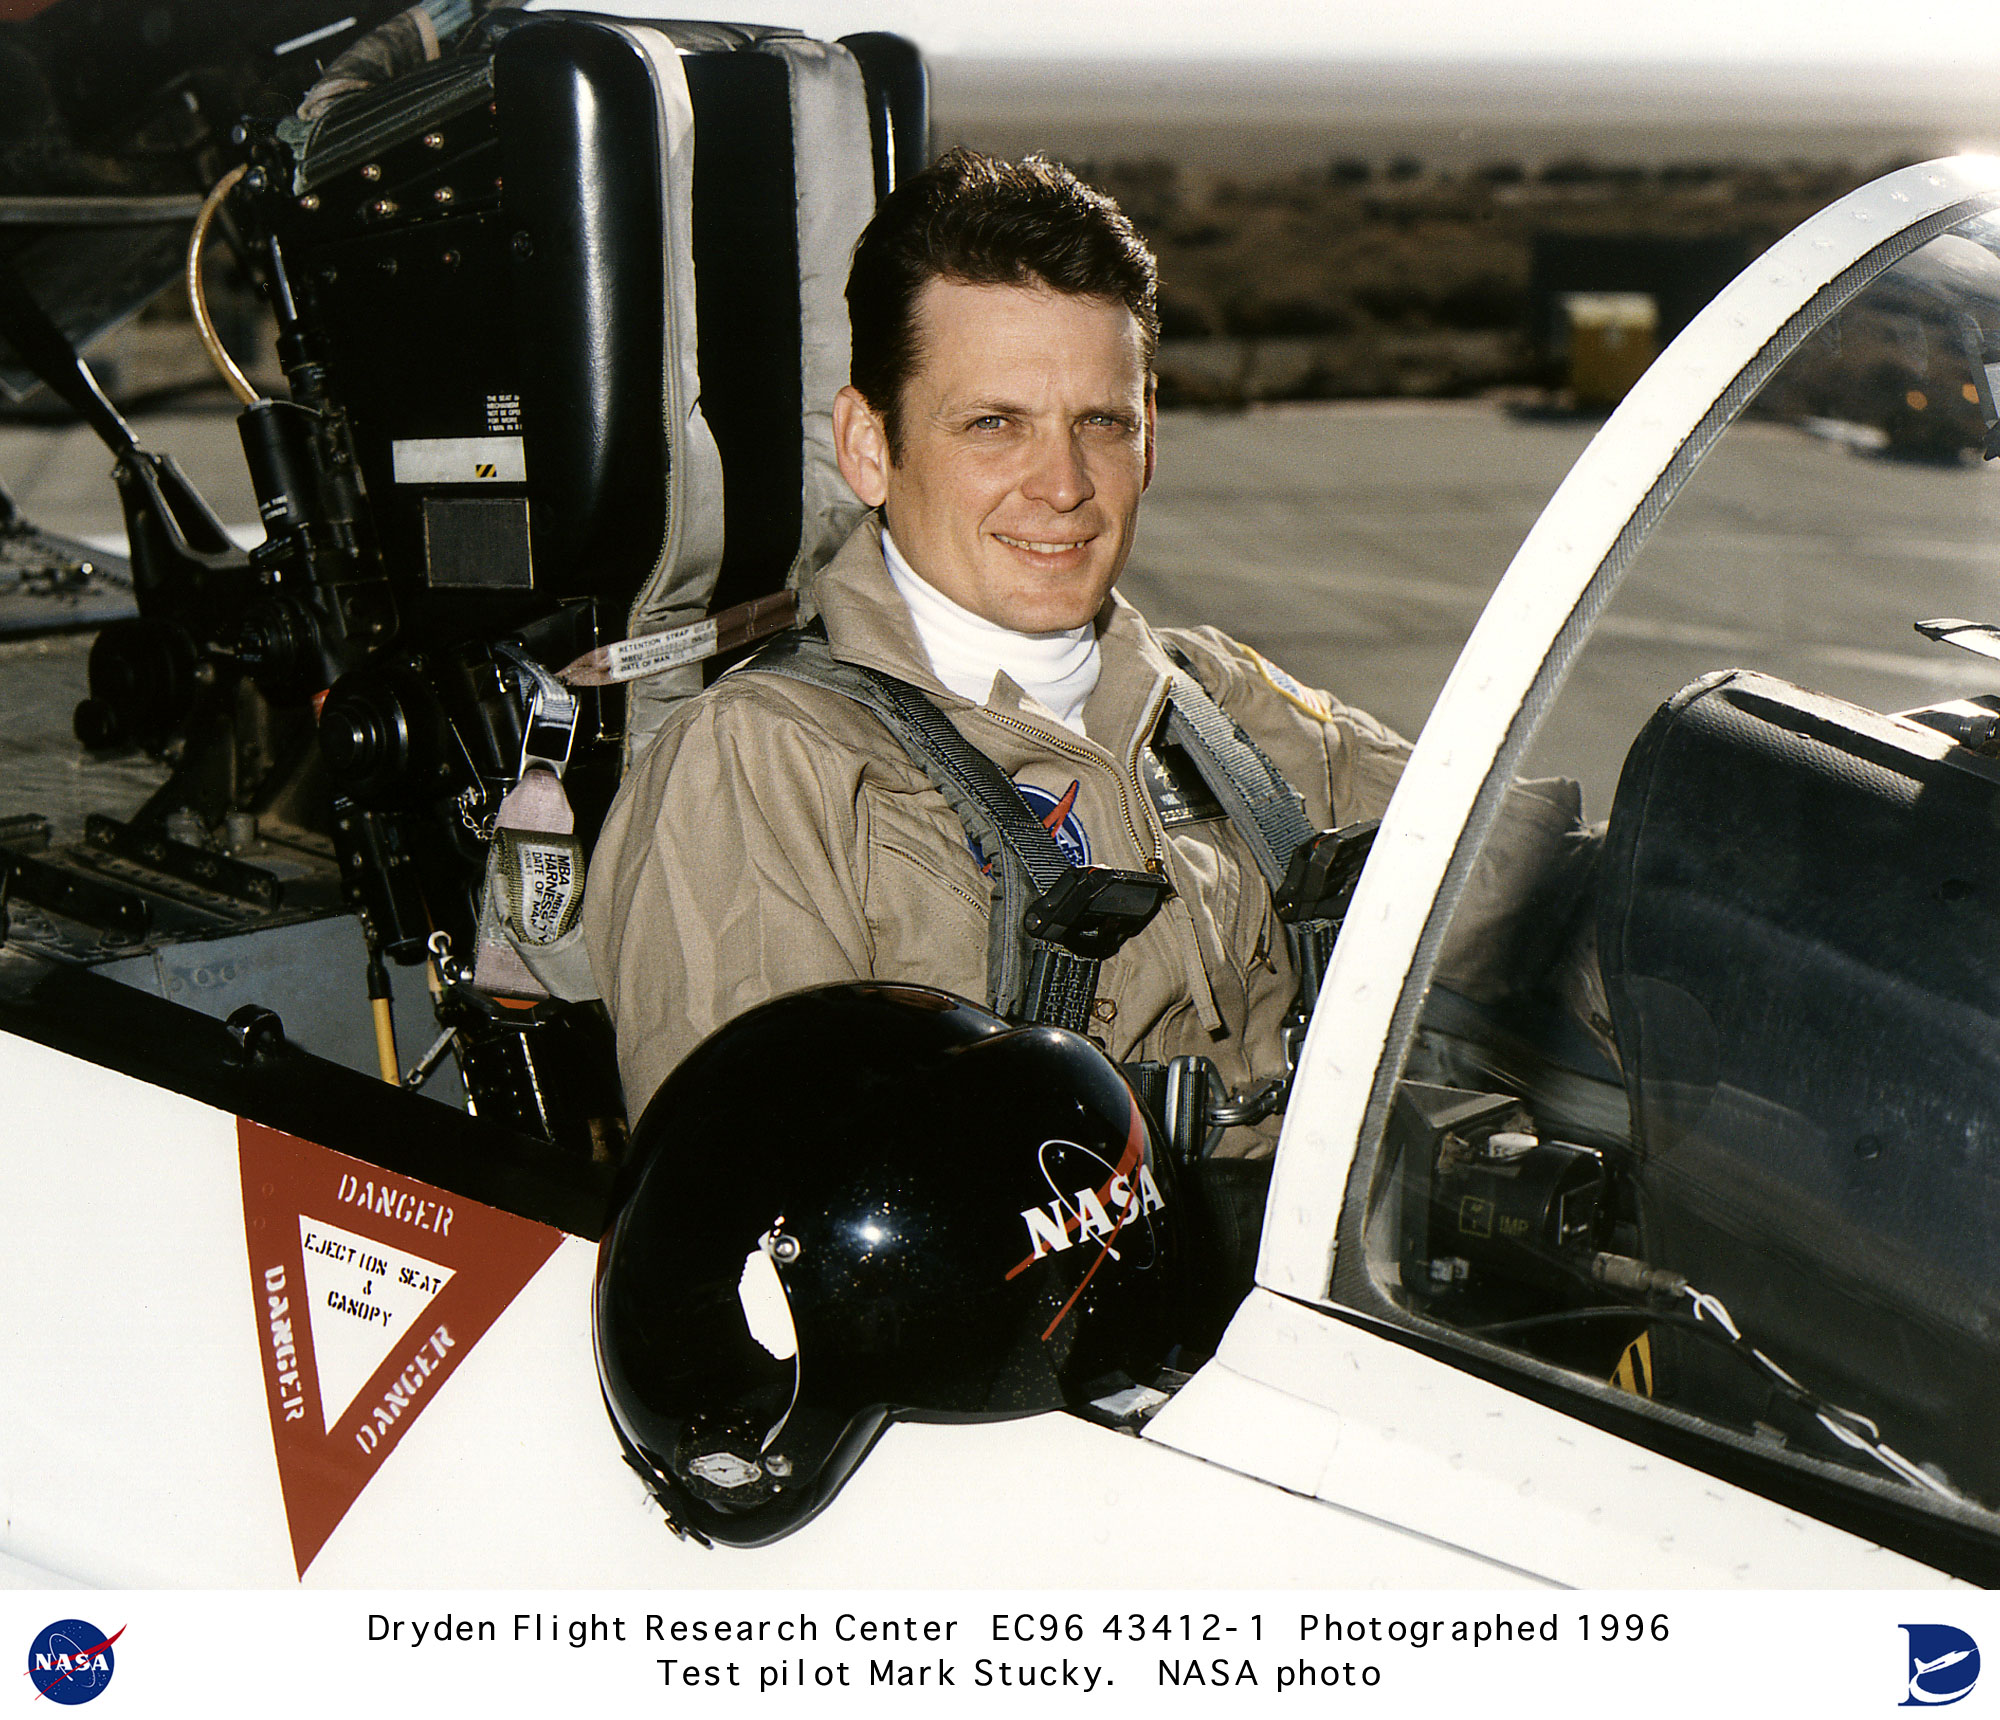 Pilots EC96-43412-1: Research pilot Mark Stucky